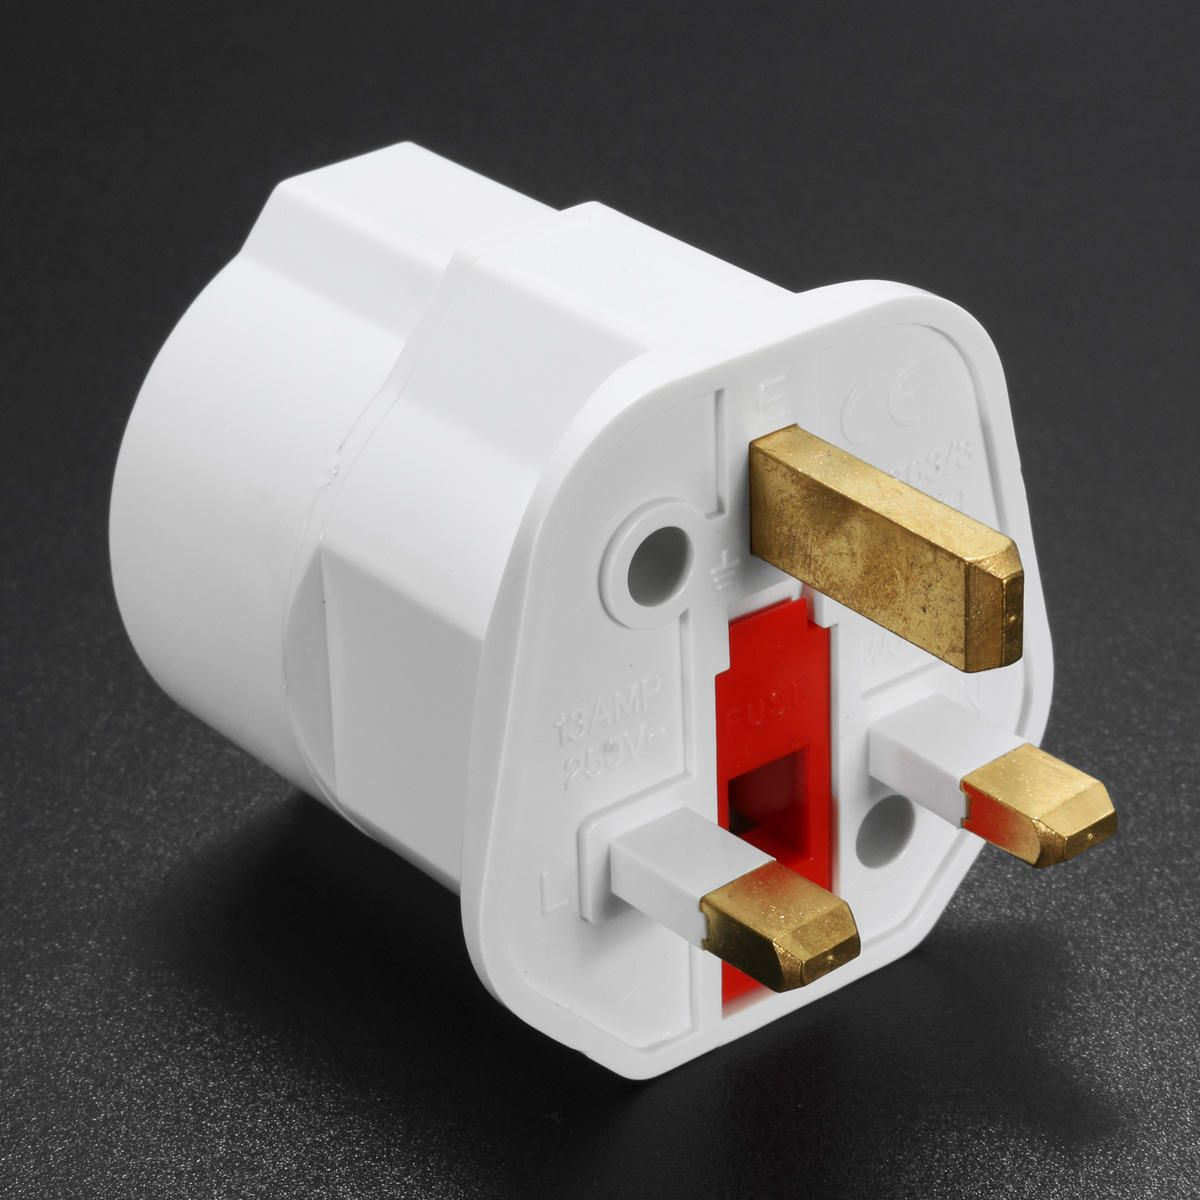 European 2 Pin To Uk 3 Pin Plug Adaptor Eu Schuko Travel Mains